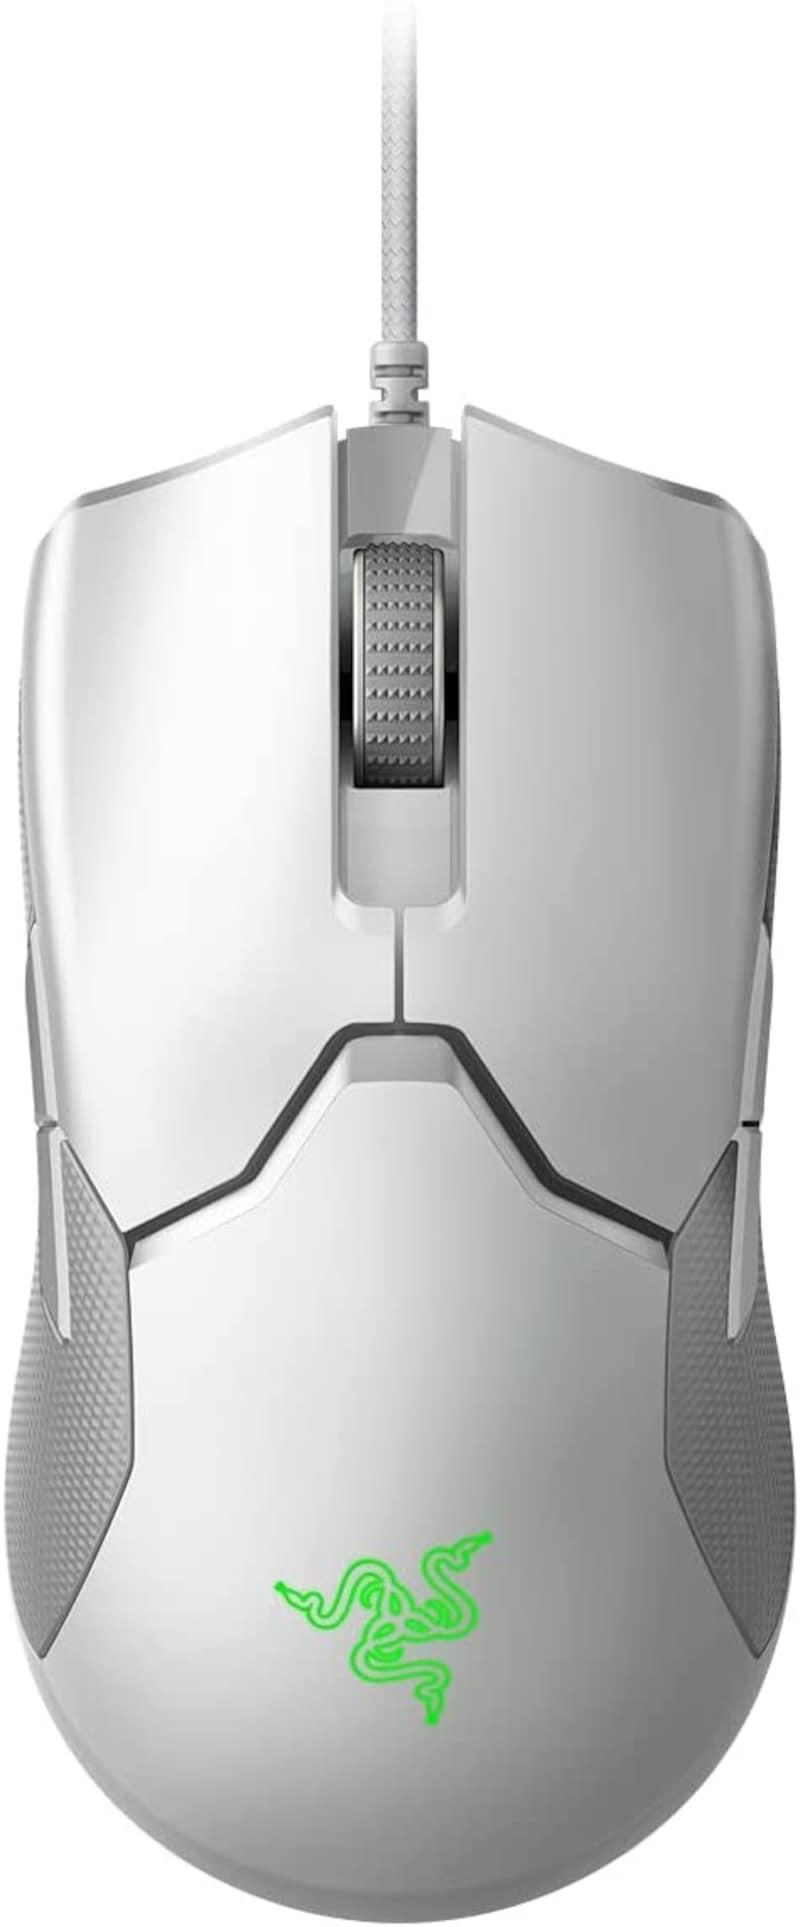 Razer(レイザー),Viper,RZ01-02550100-R3M1